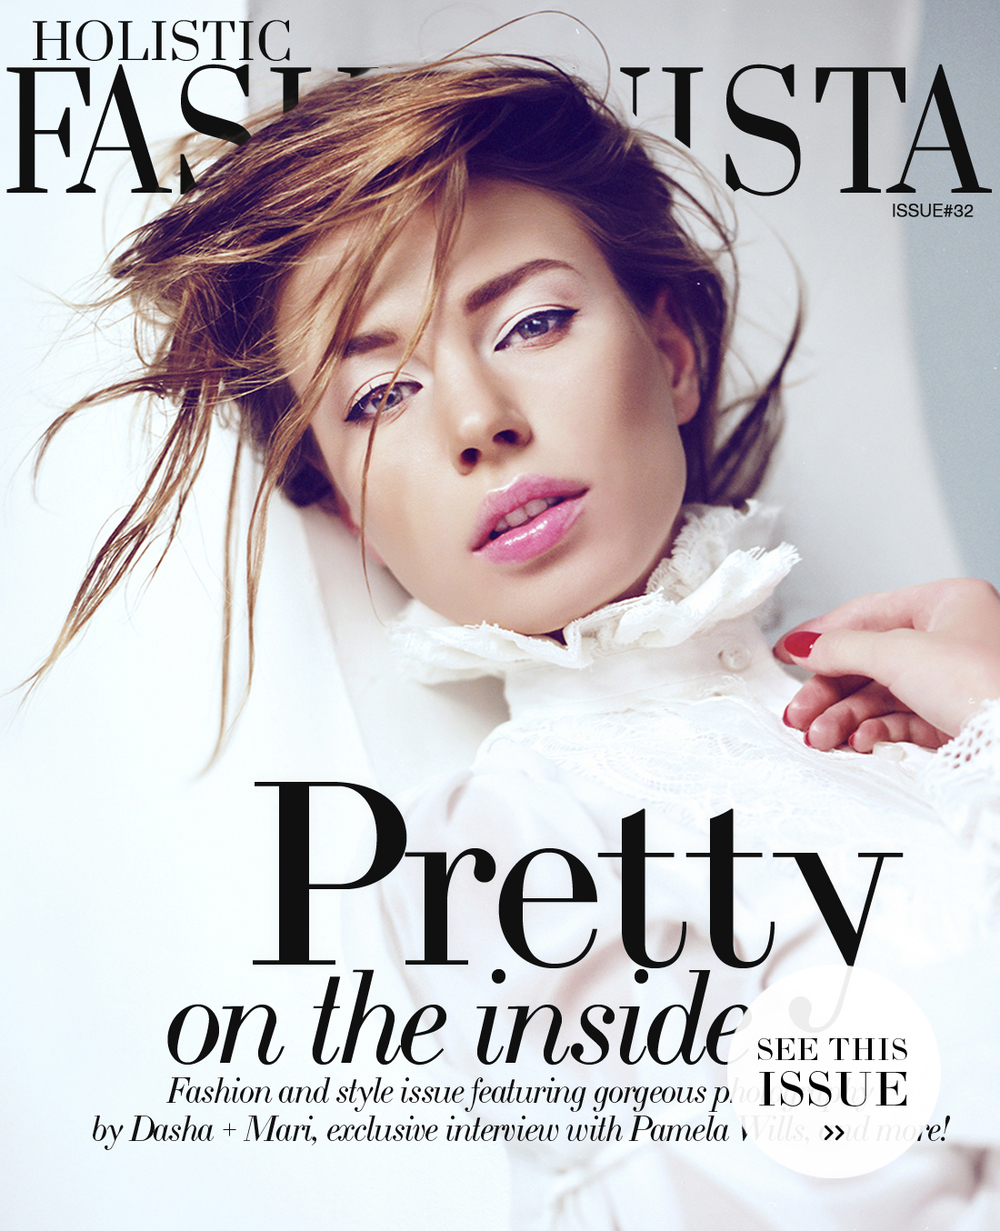 holistic-fashionista-magazine